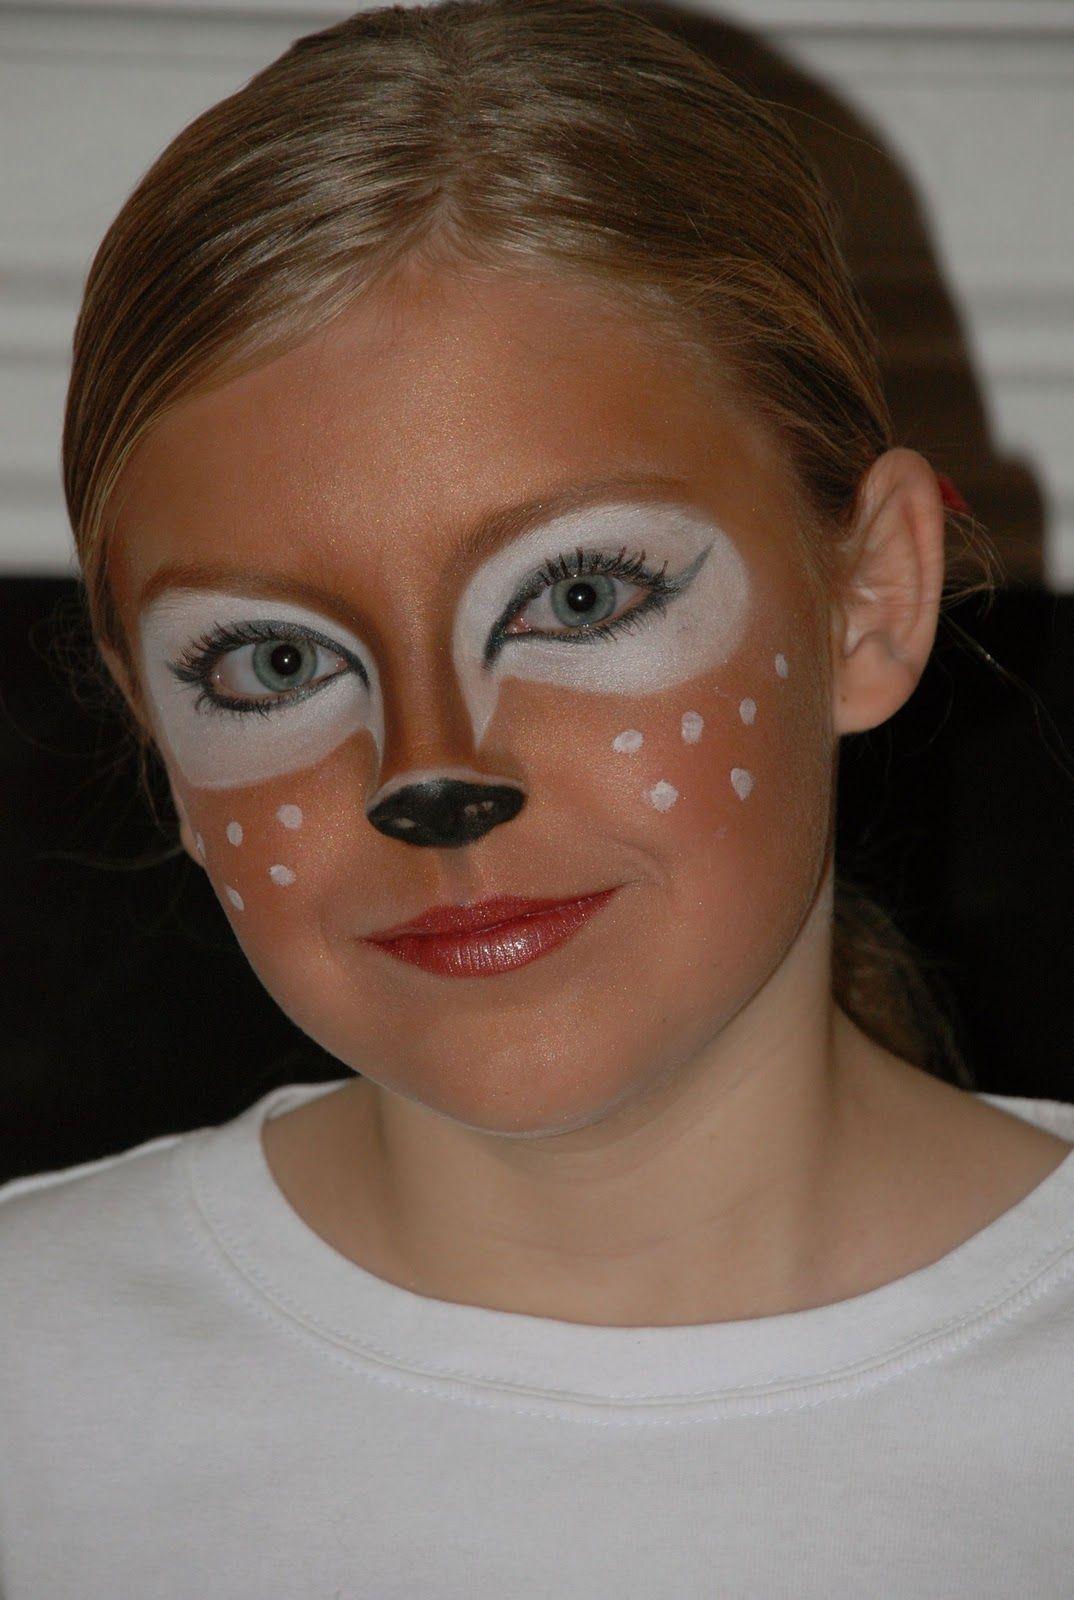 deer makeup 2 karneval helau pinterest kinderschminken fasching schminken und kost m. Black Bedroom Furniture Sets. Home Design Ideas